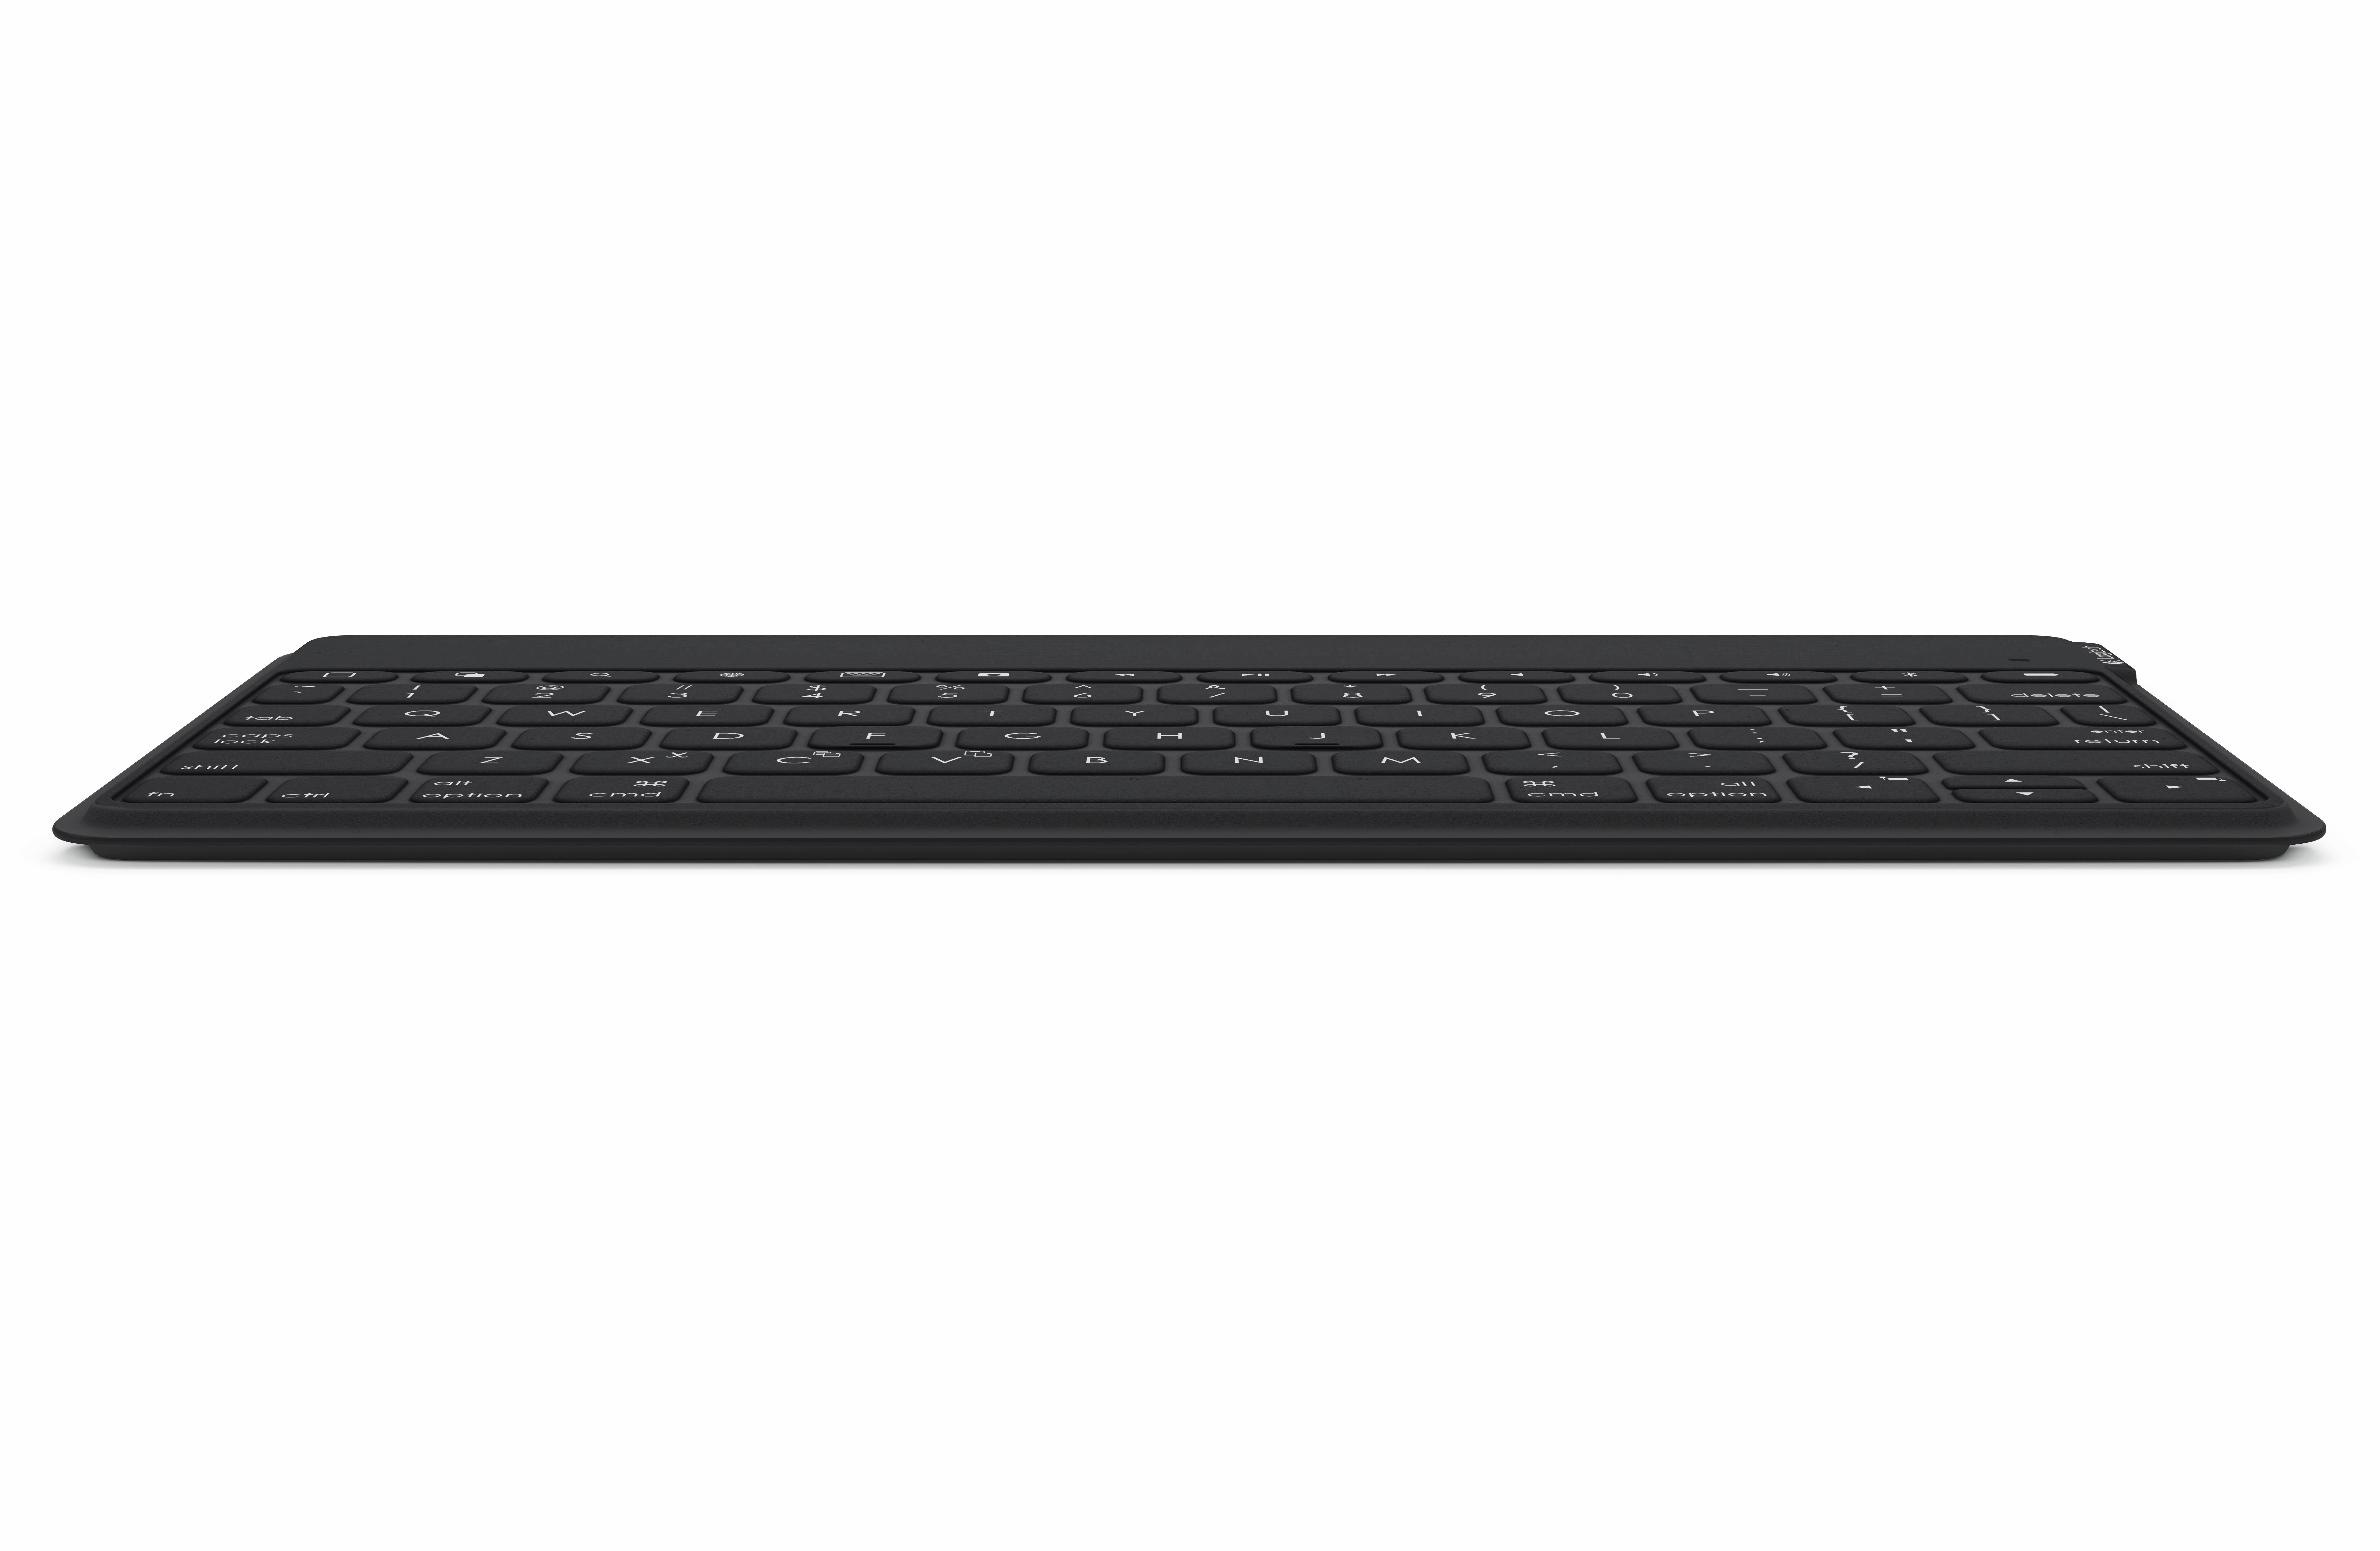 Keys-To-Go Ultra-Portable Keyboard voor iPad(zwart, Qwerty UK, BlueTooth)